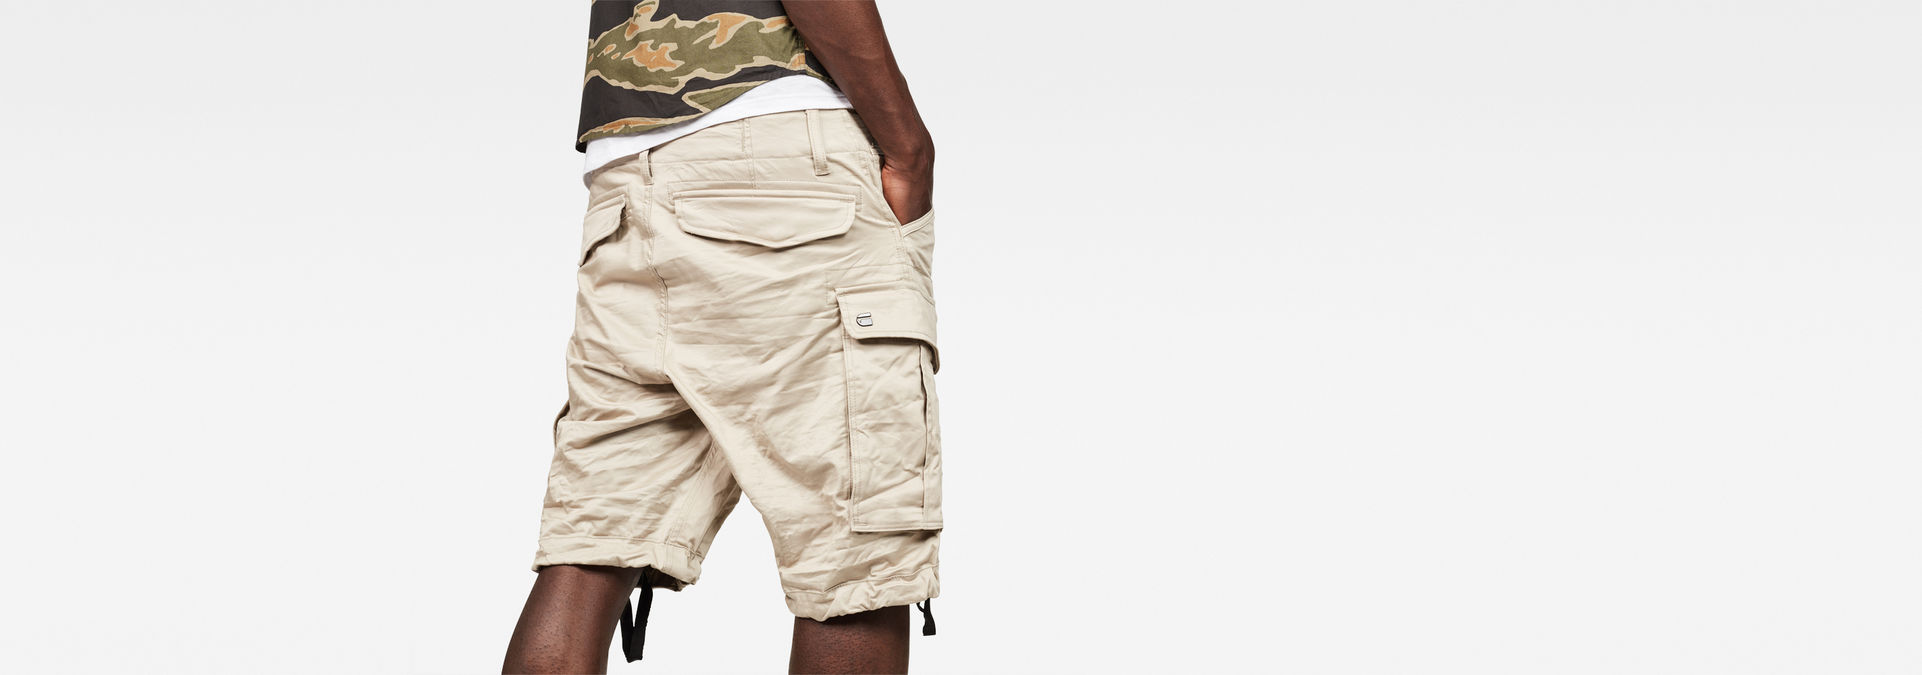 Rovic Zip Relaxed 12 Length Shorts | Dark Brick | G Star RAW®